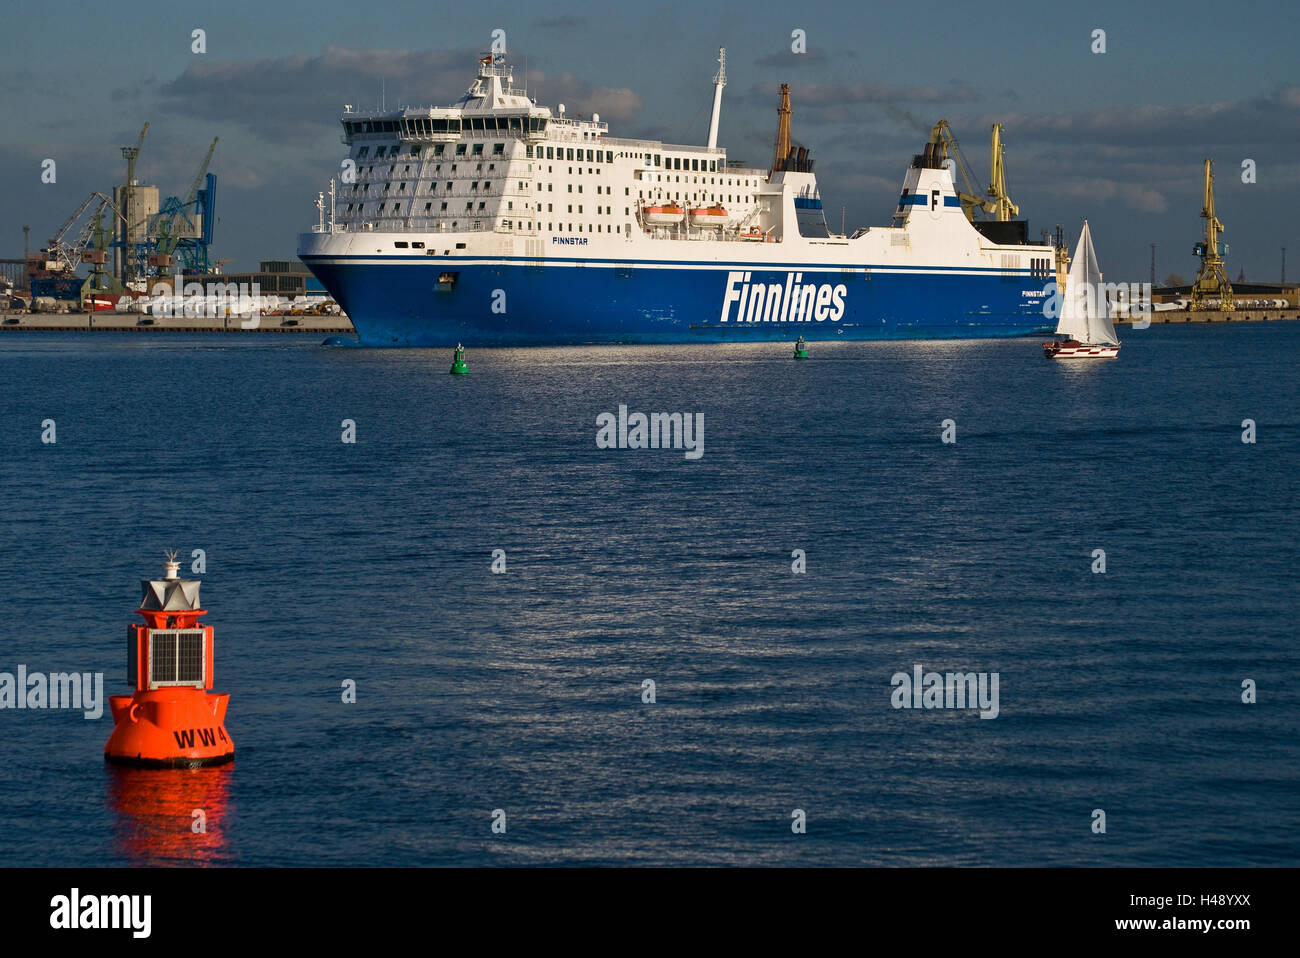 Germany, Mecklenburg-Western Pomerania, Rostock-Warnemünde, ferry, - Stock Image